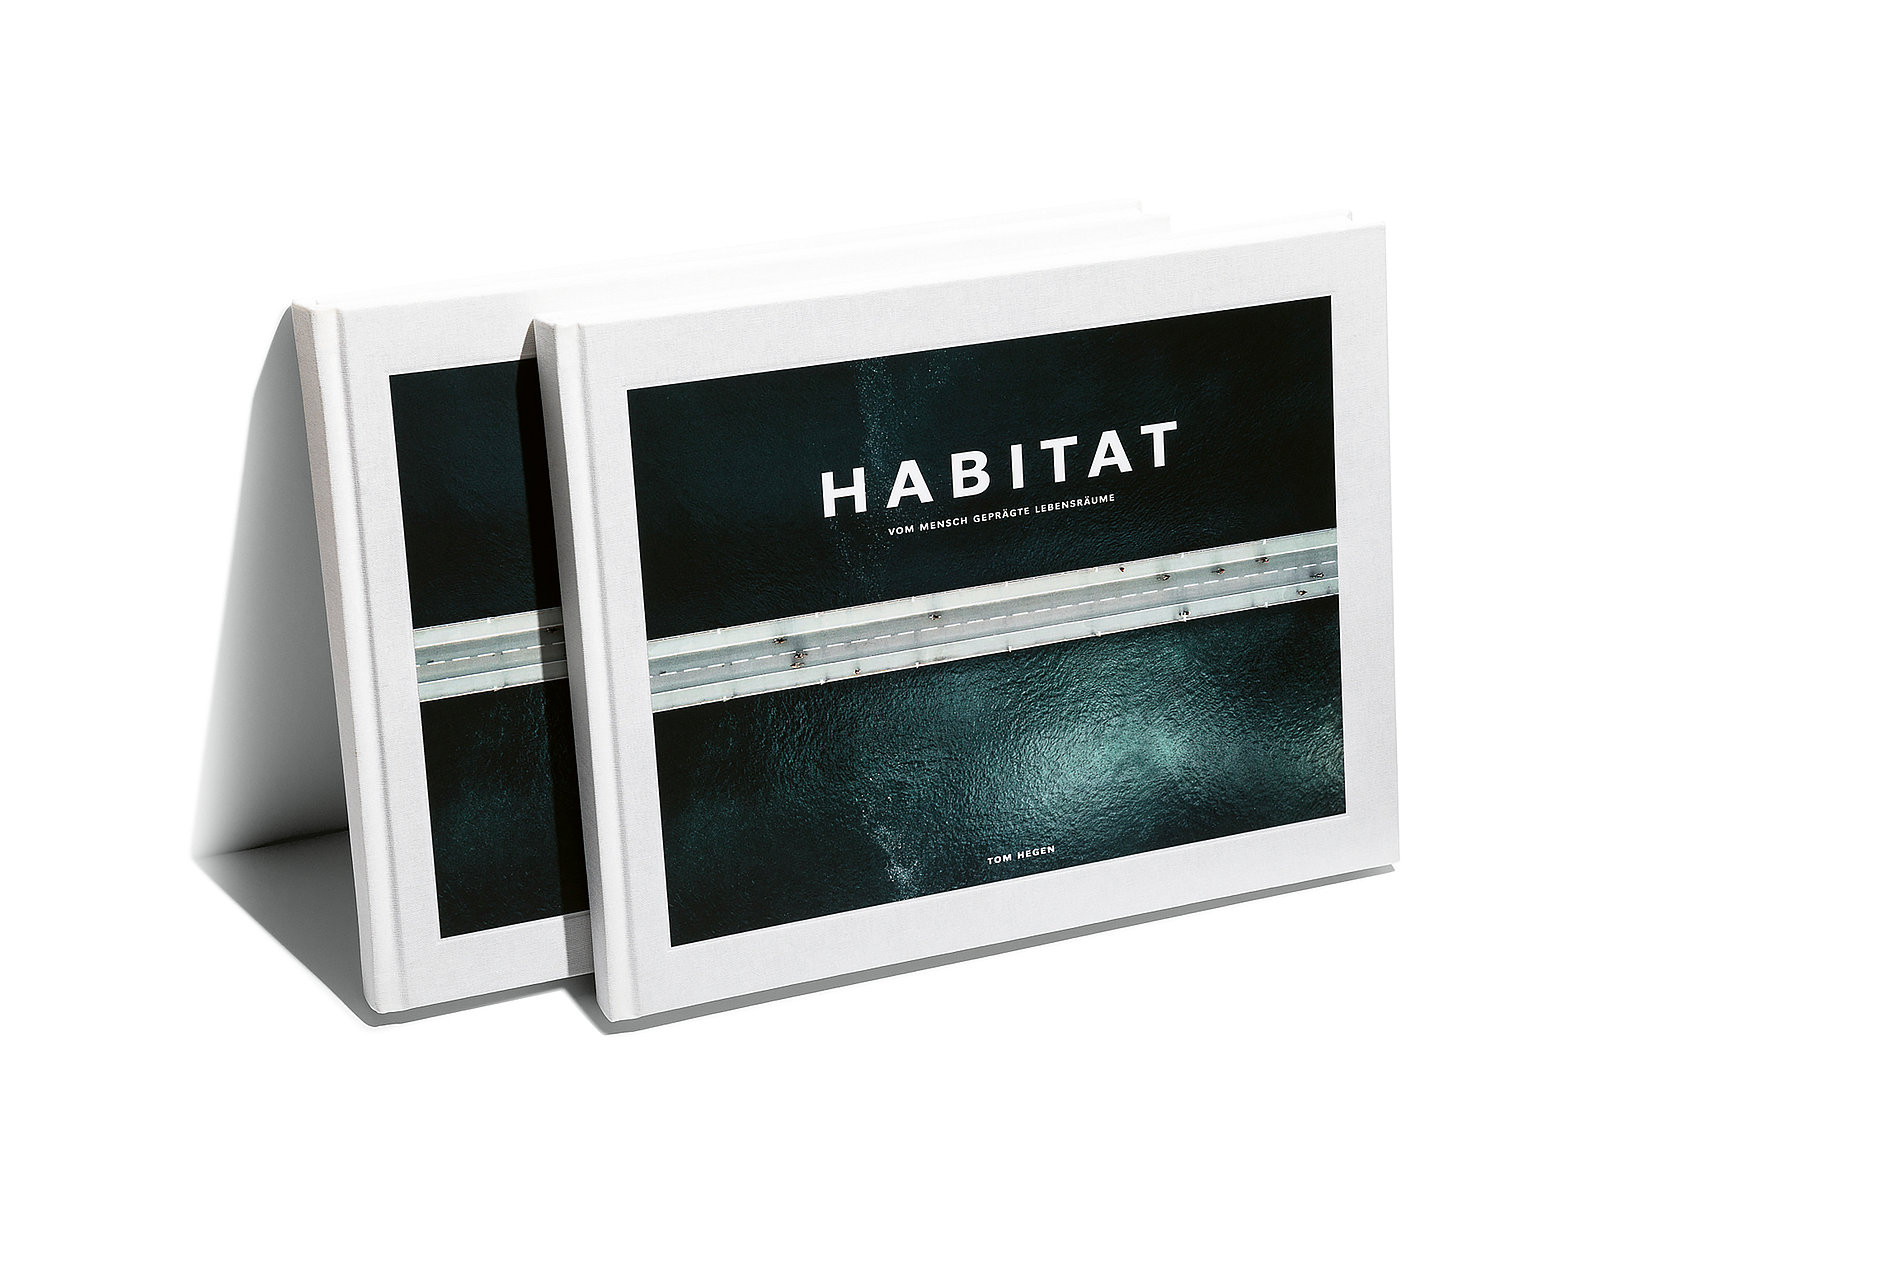 HABITAT – Vom Mensch geprägte Lebensräume | Red Dot Design Award